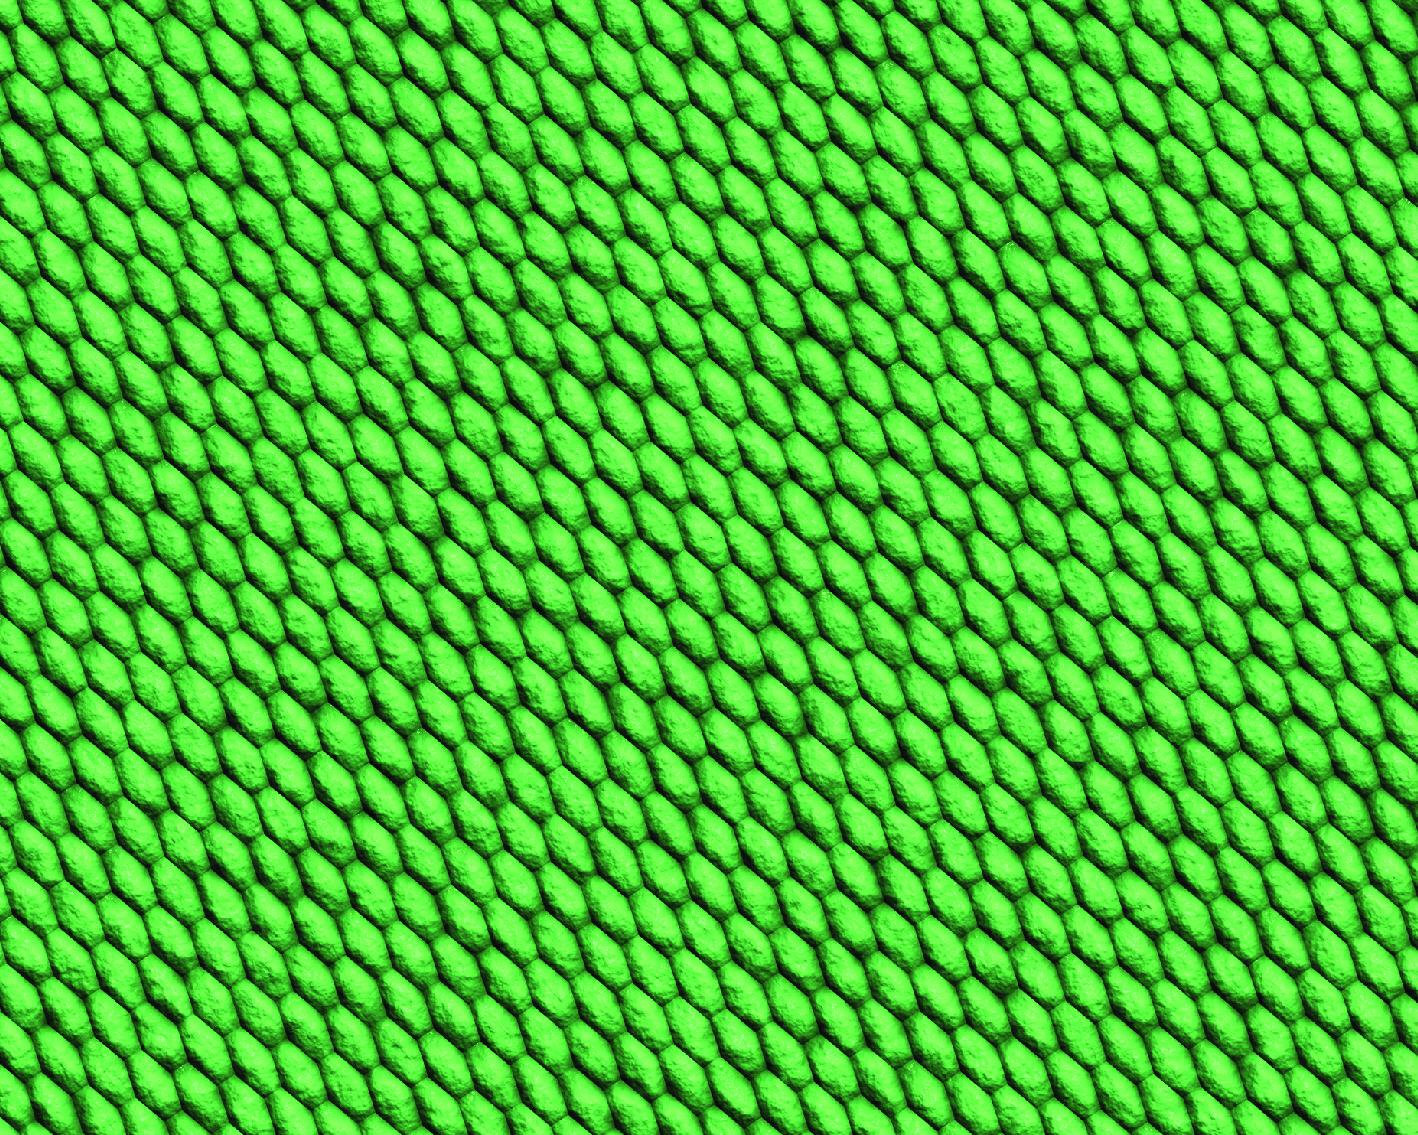 snake skins-12